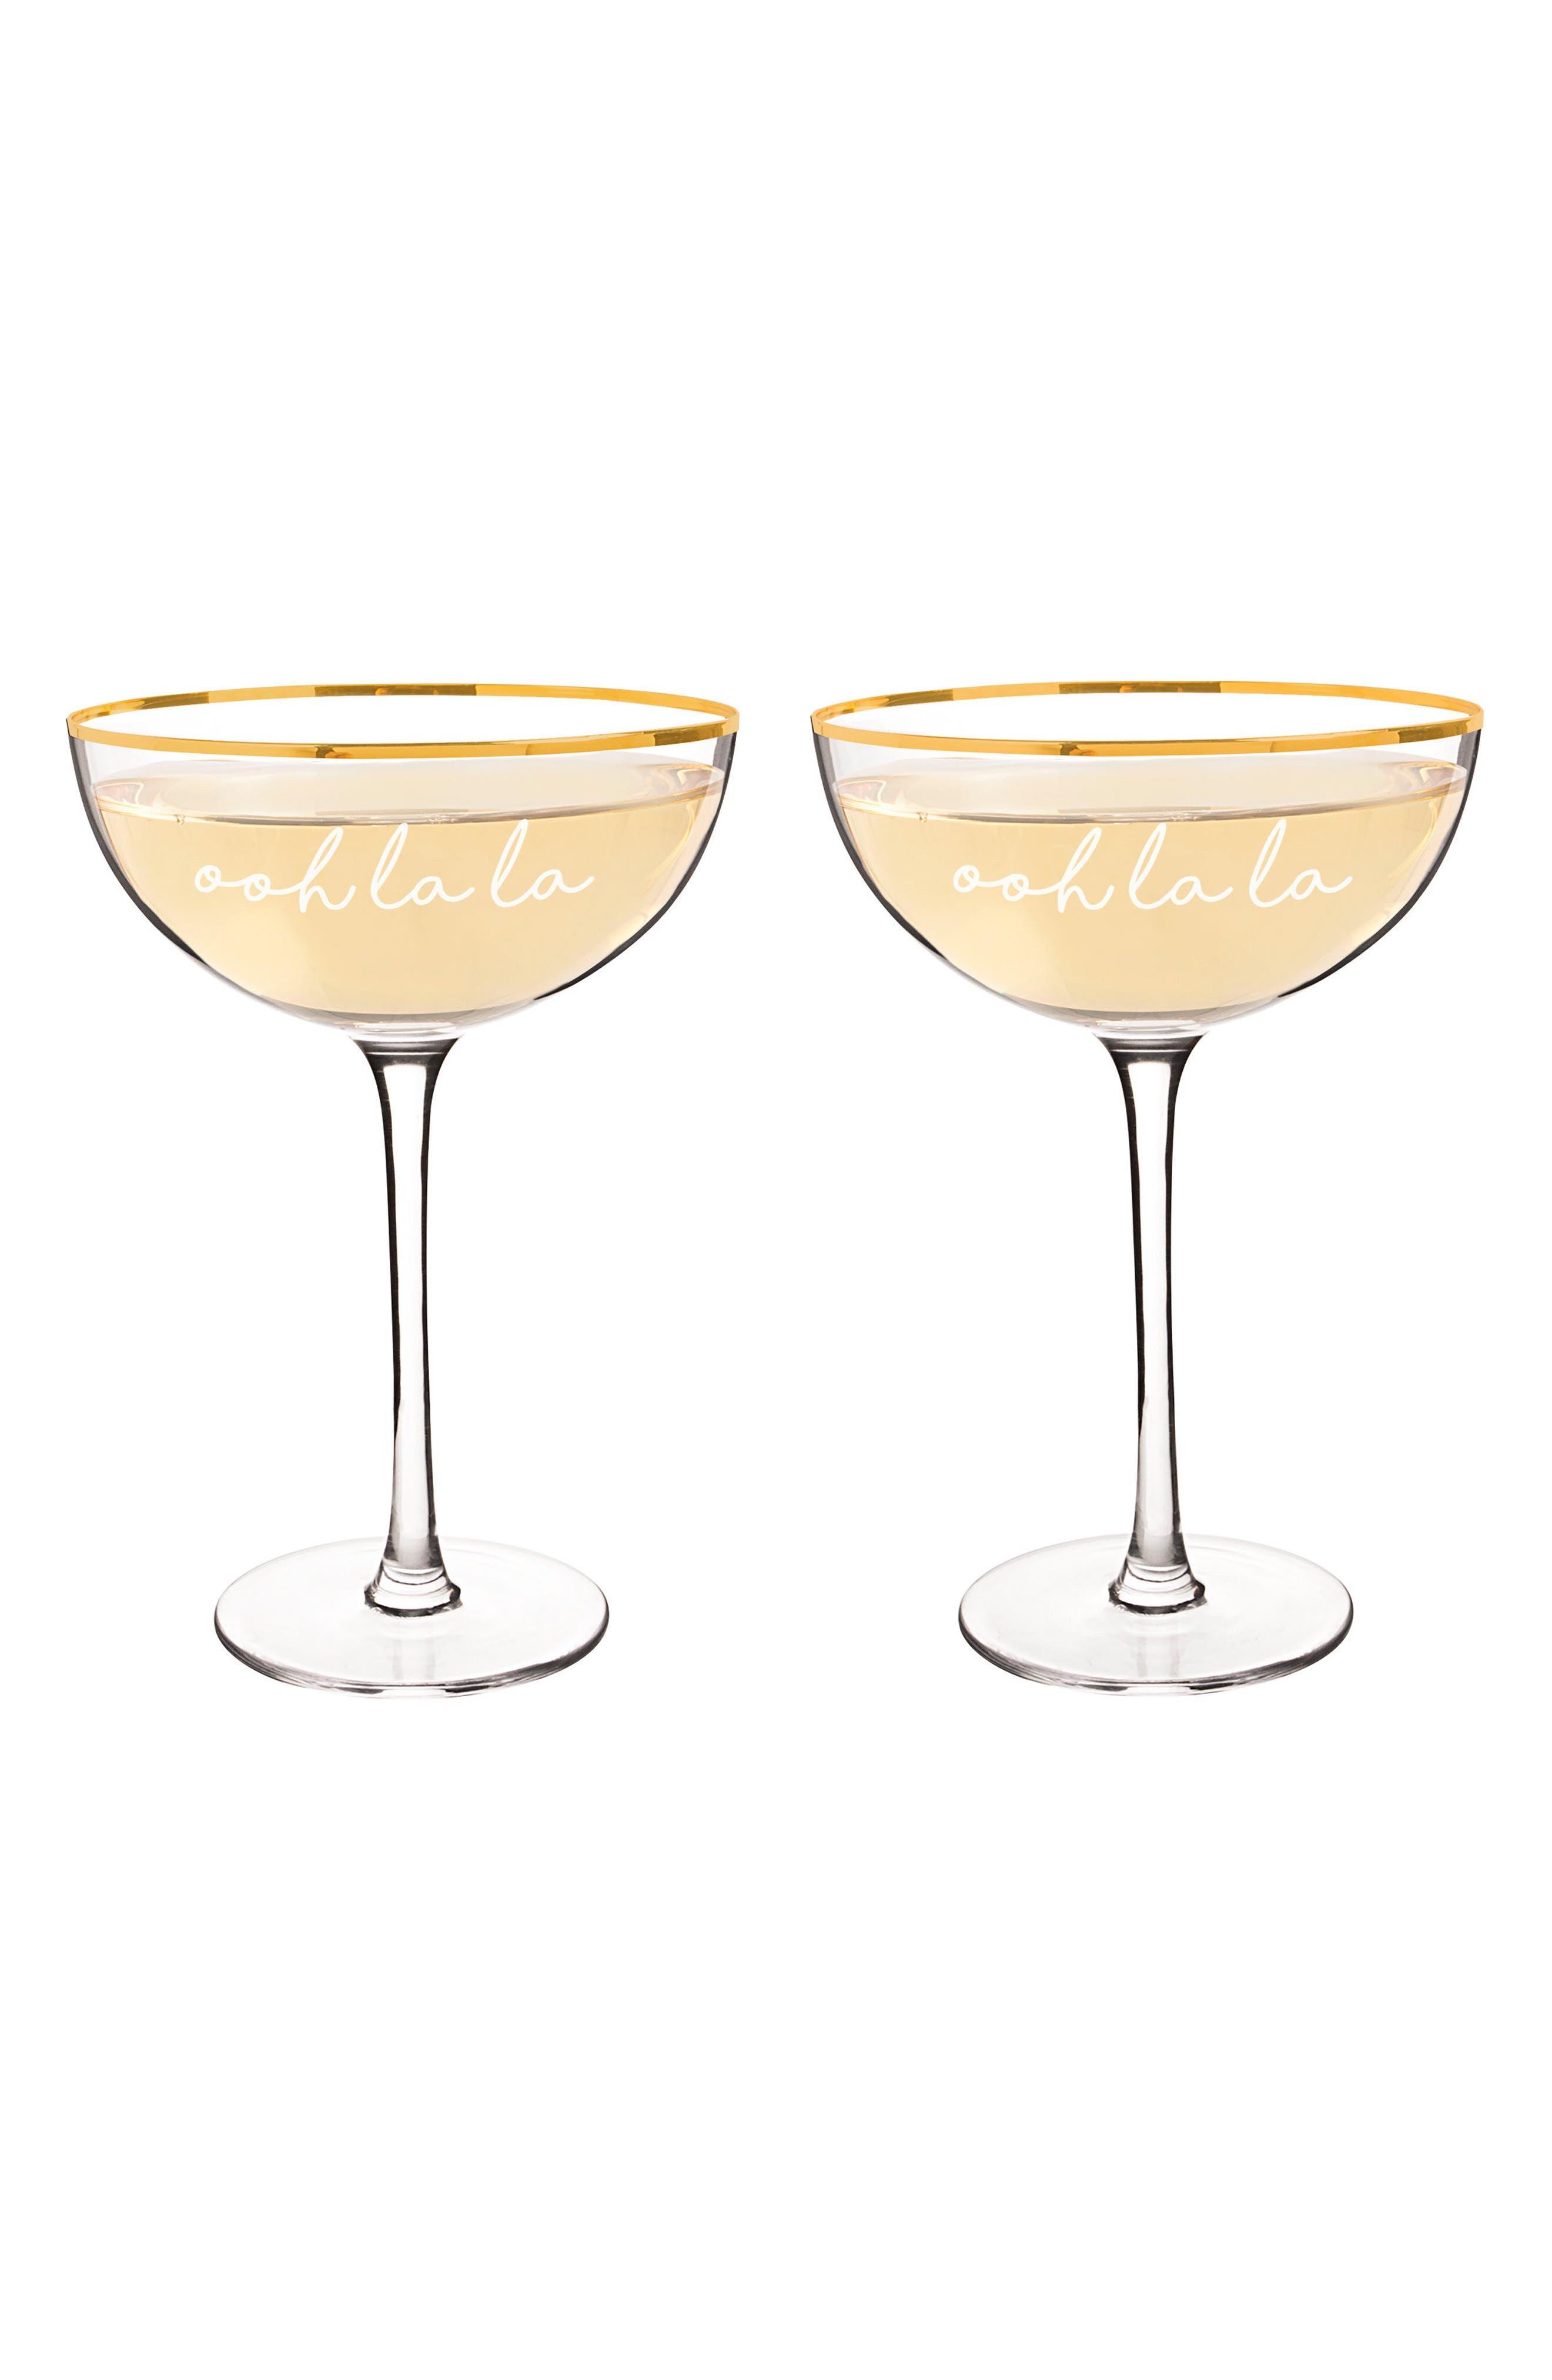 Ooh La La Set of 2 Champagne Coupes,                         Main,                         color, 100